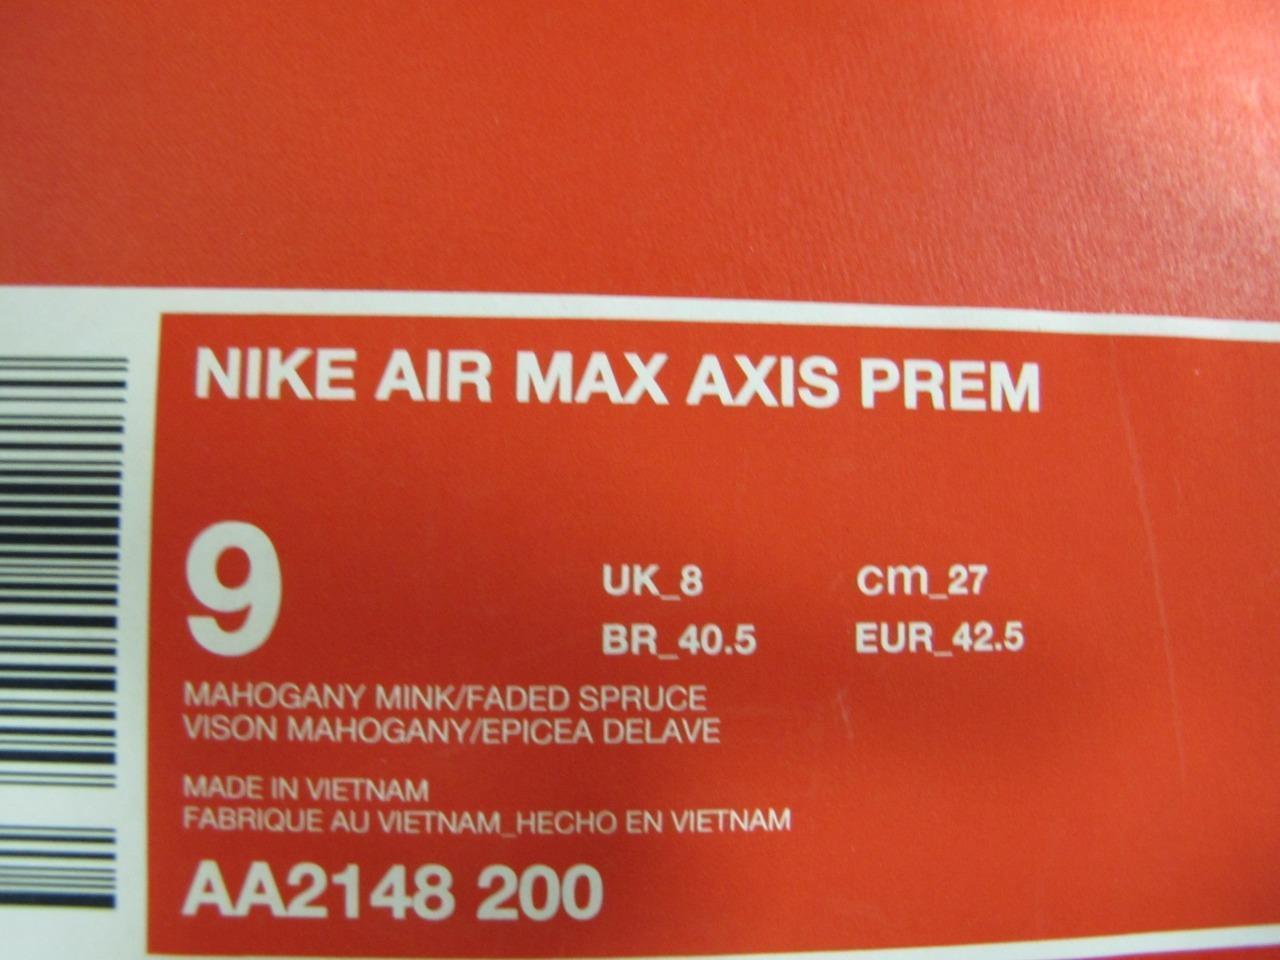 NEW uomo NIKE AIR MAX AXIS PREM PREM PREM AA2148-200 773bc7